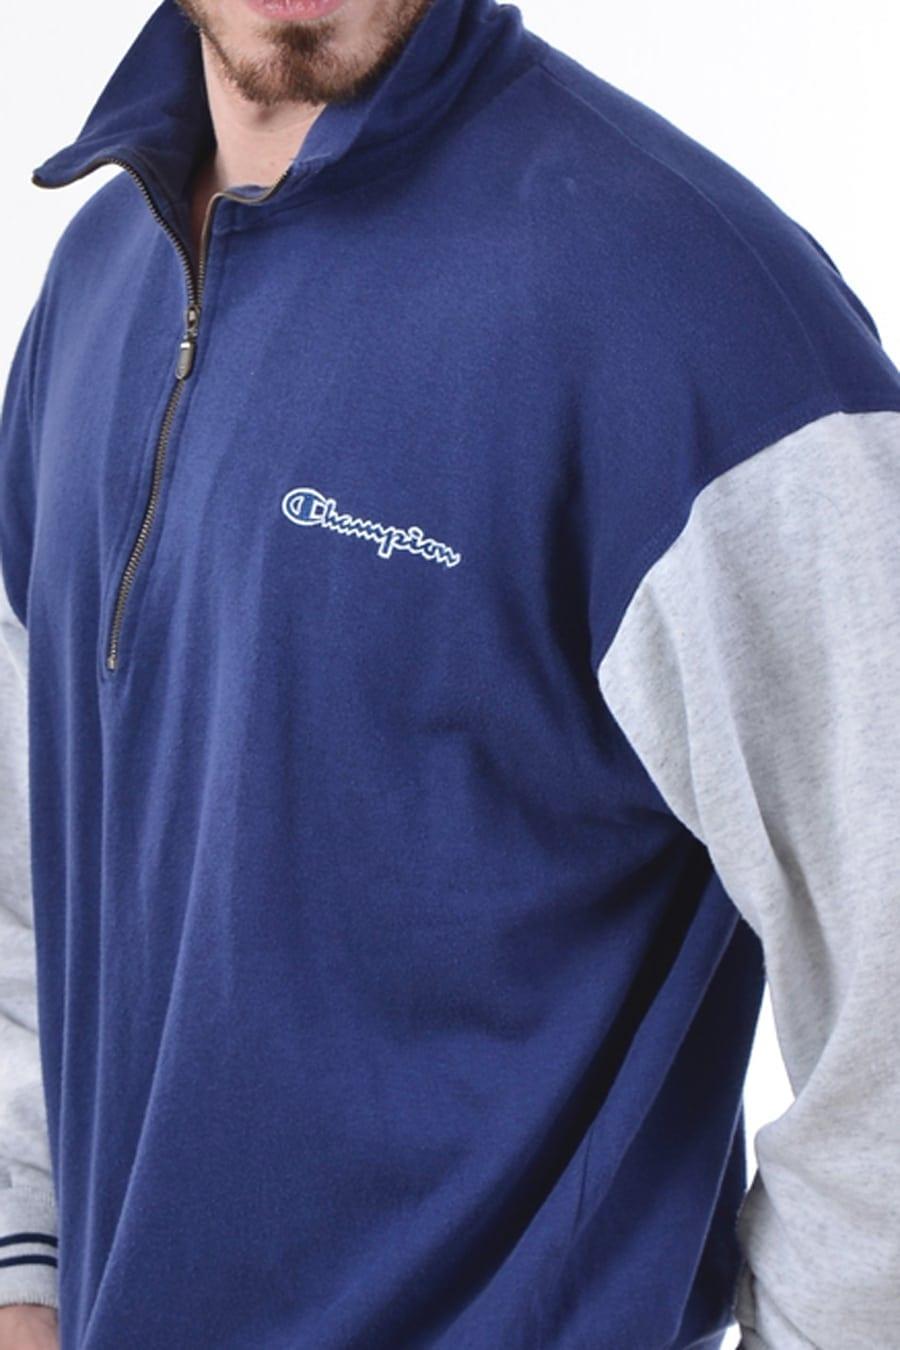 Vintage Champion Blue /& Grey Sweatshirt L www.brickvintage.com